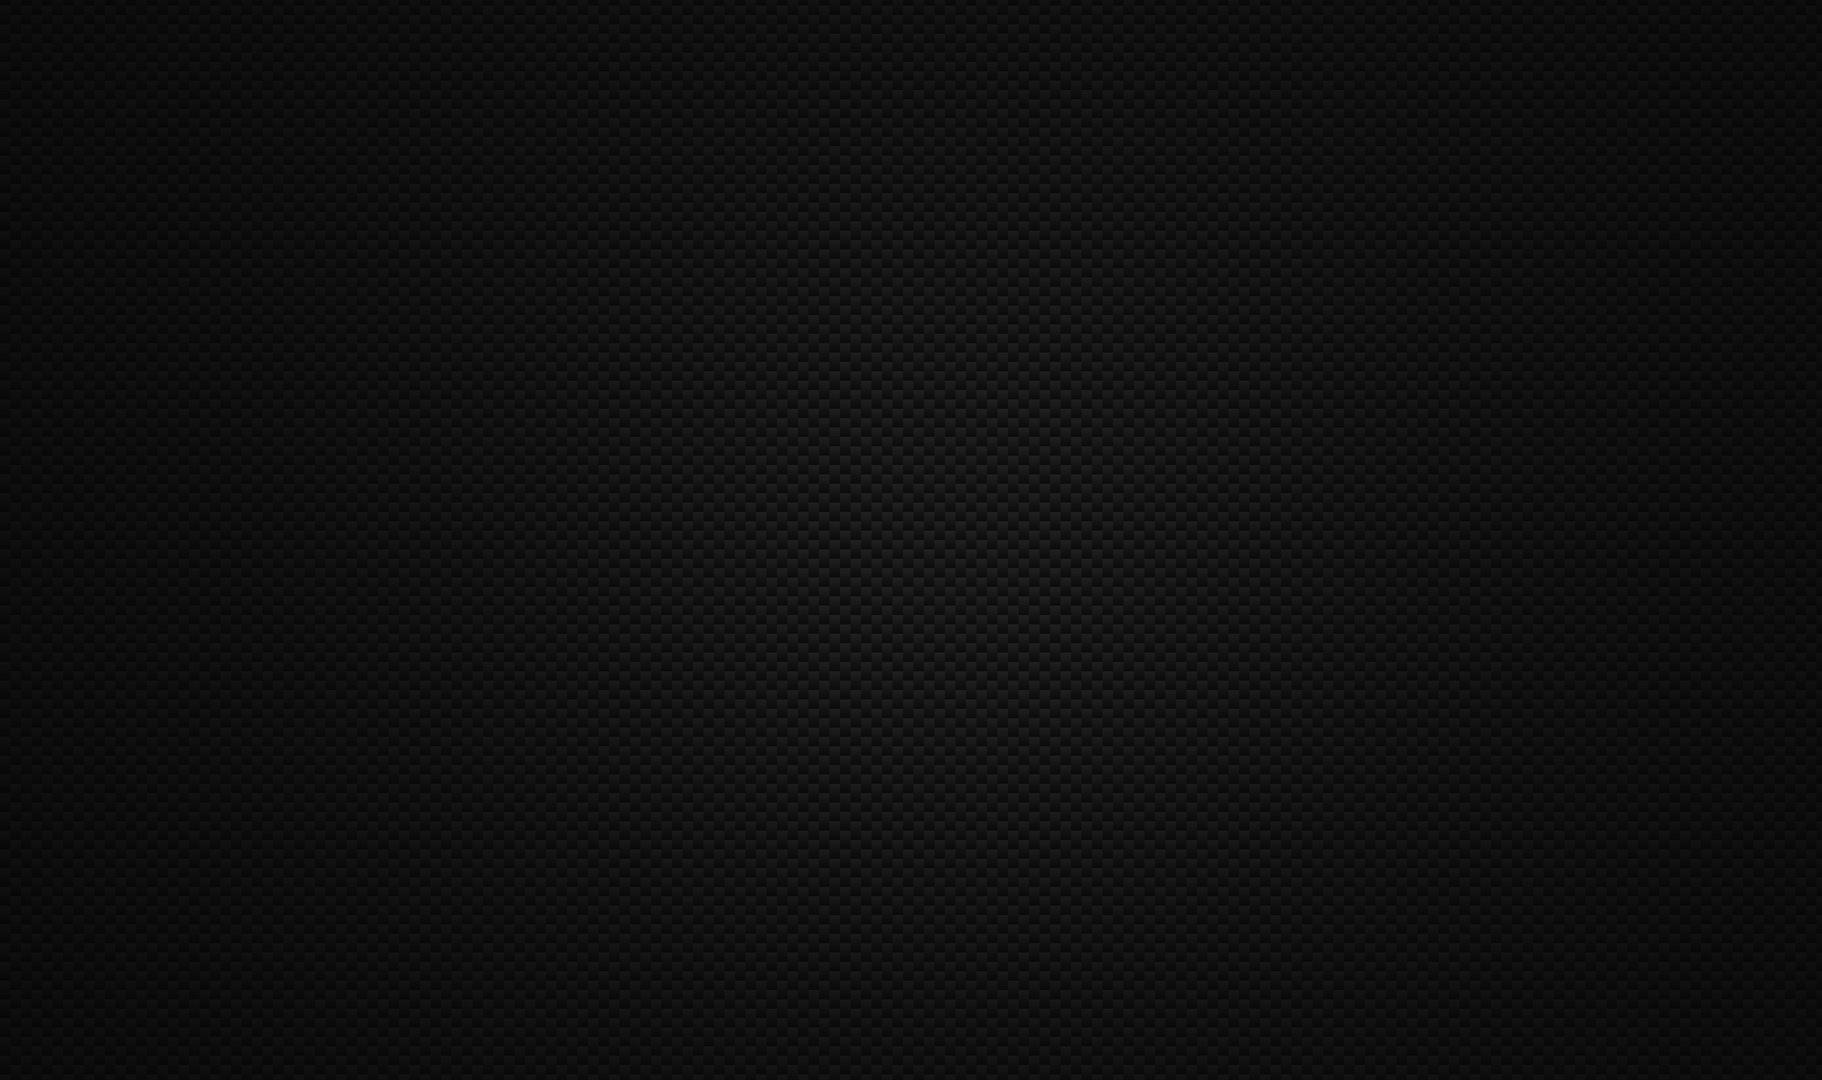 Carbon Fiber Pattern 1822x1080